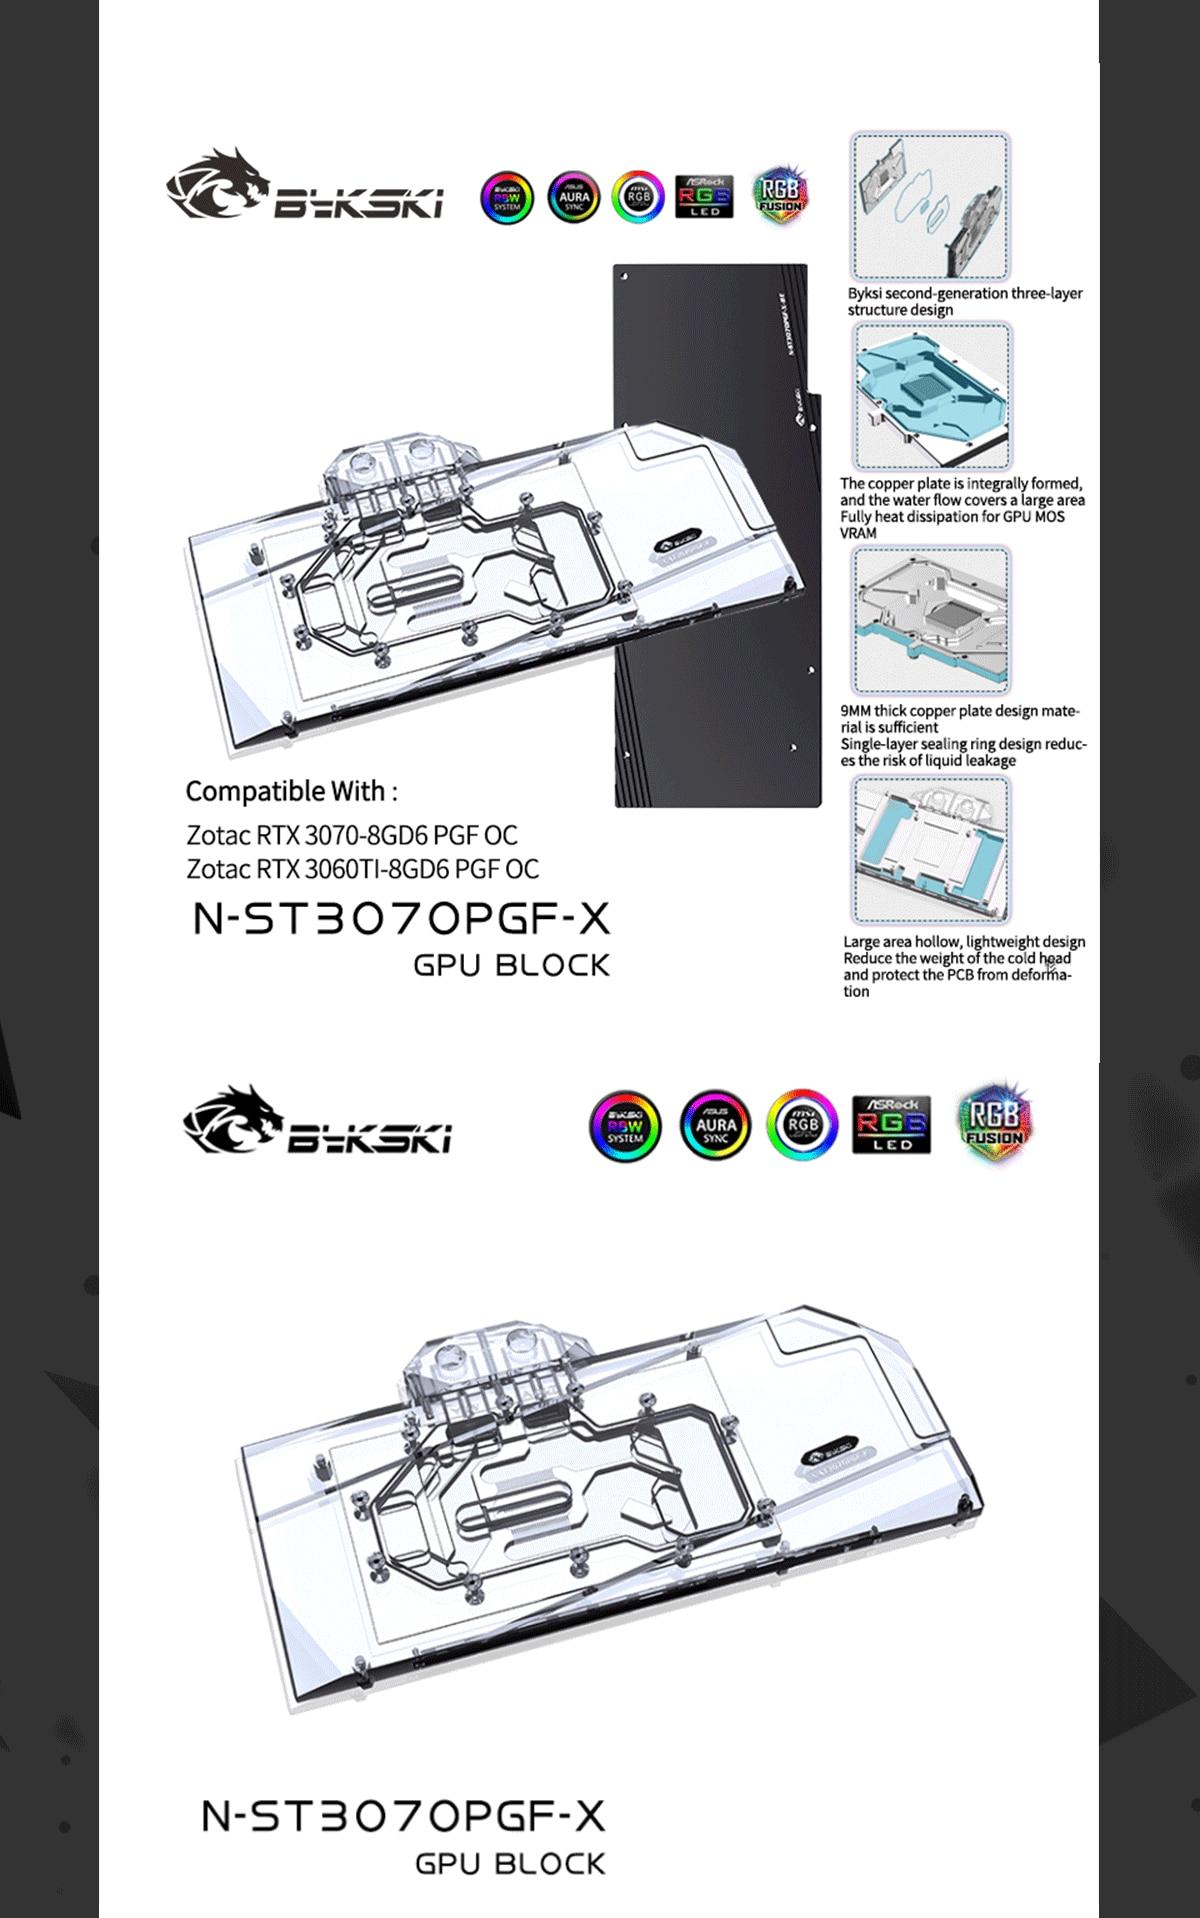 Bykski GPU Block For Zotac RTX 3060TI / 3070-8GD6 PGF OC , With Backplate GPU Water Cooling Cooler, N-ST3070PGF-X